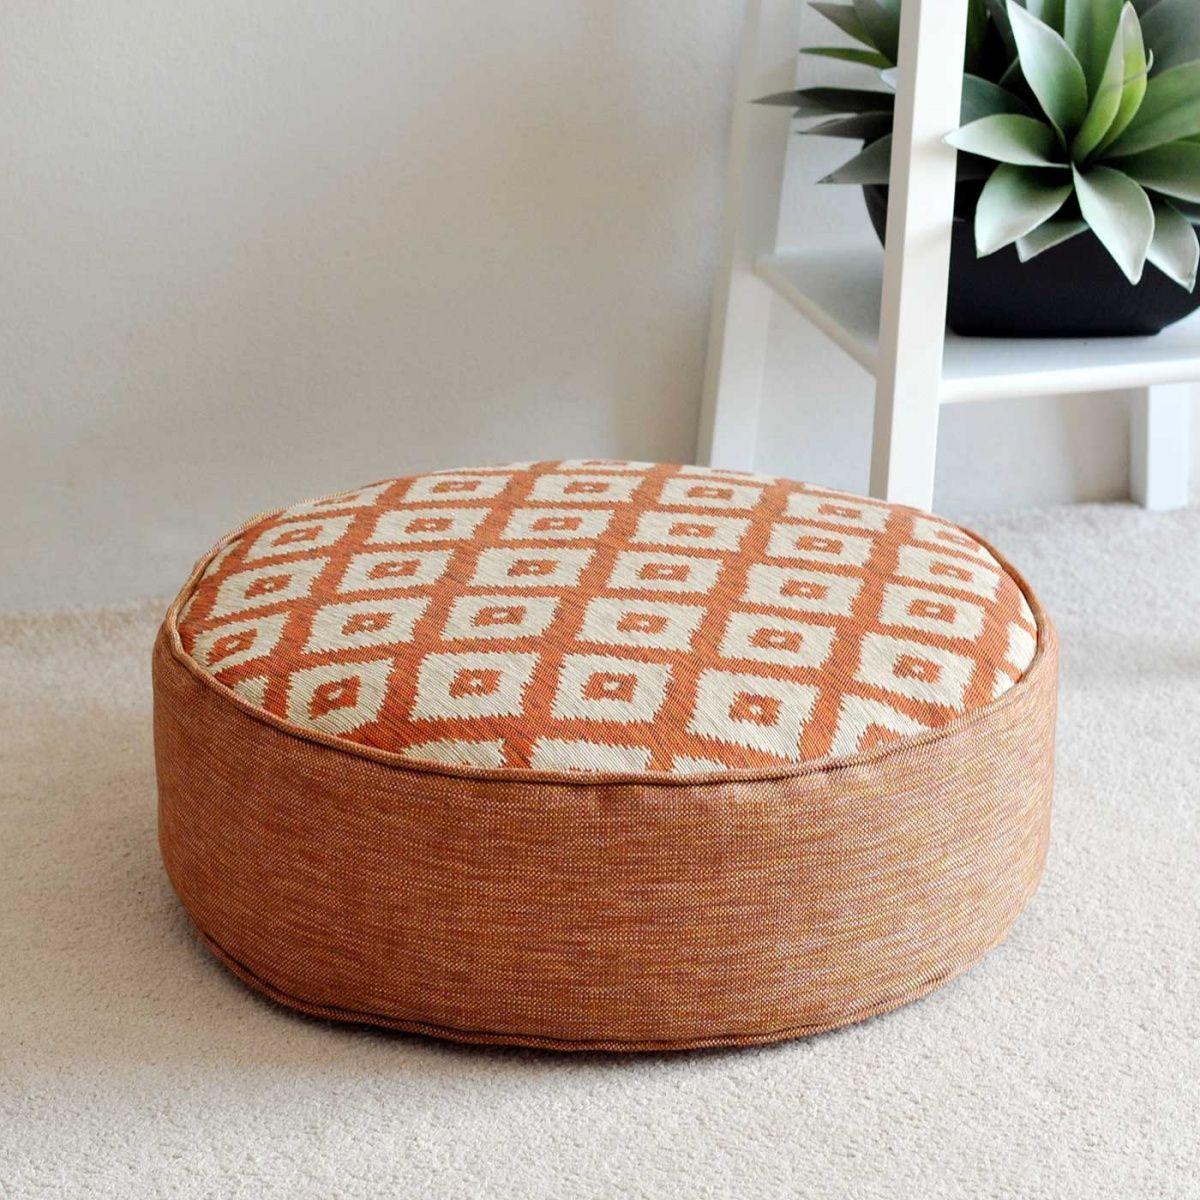 Ubud Tangerine Round Floor Cushion 18cm | Floor Cushions | Pinterest